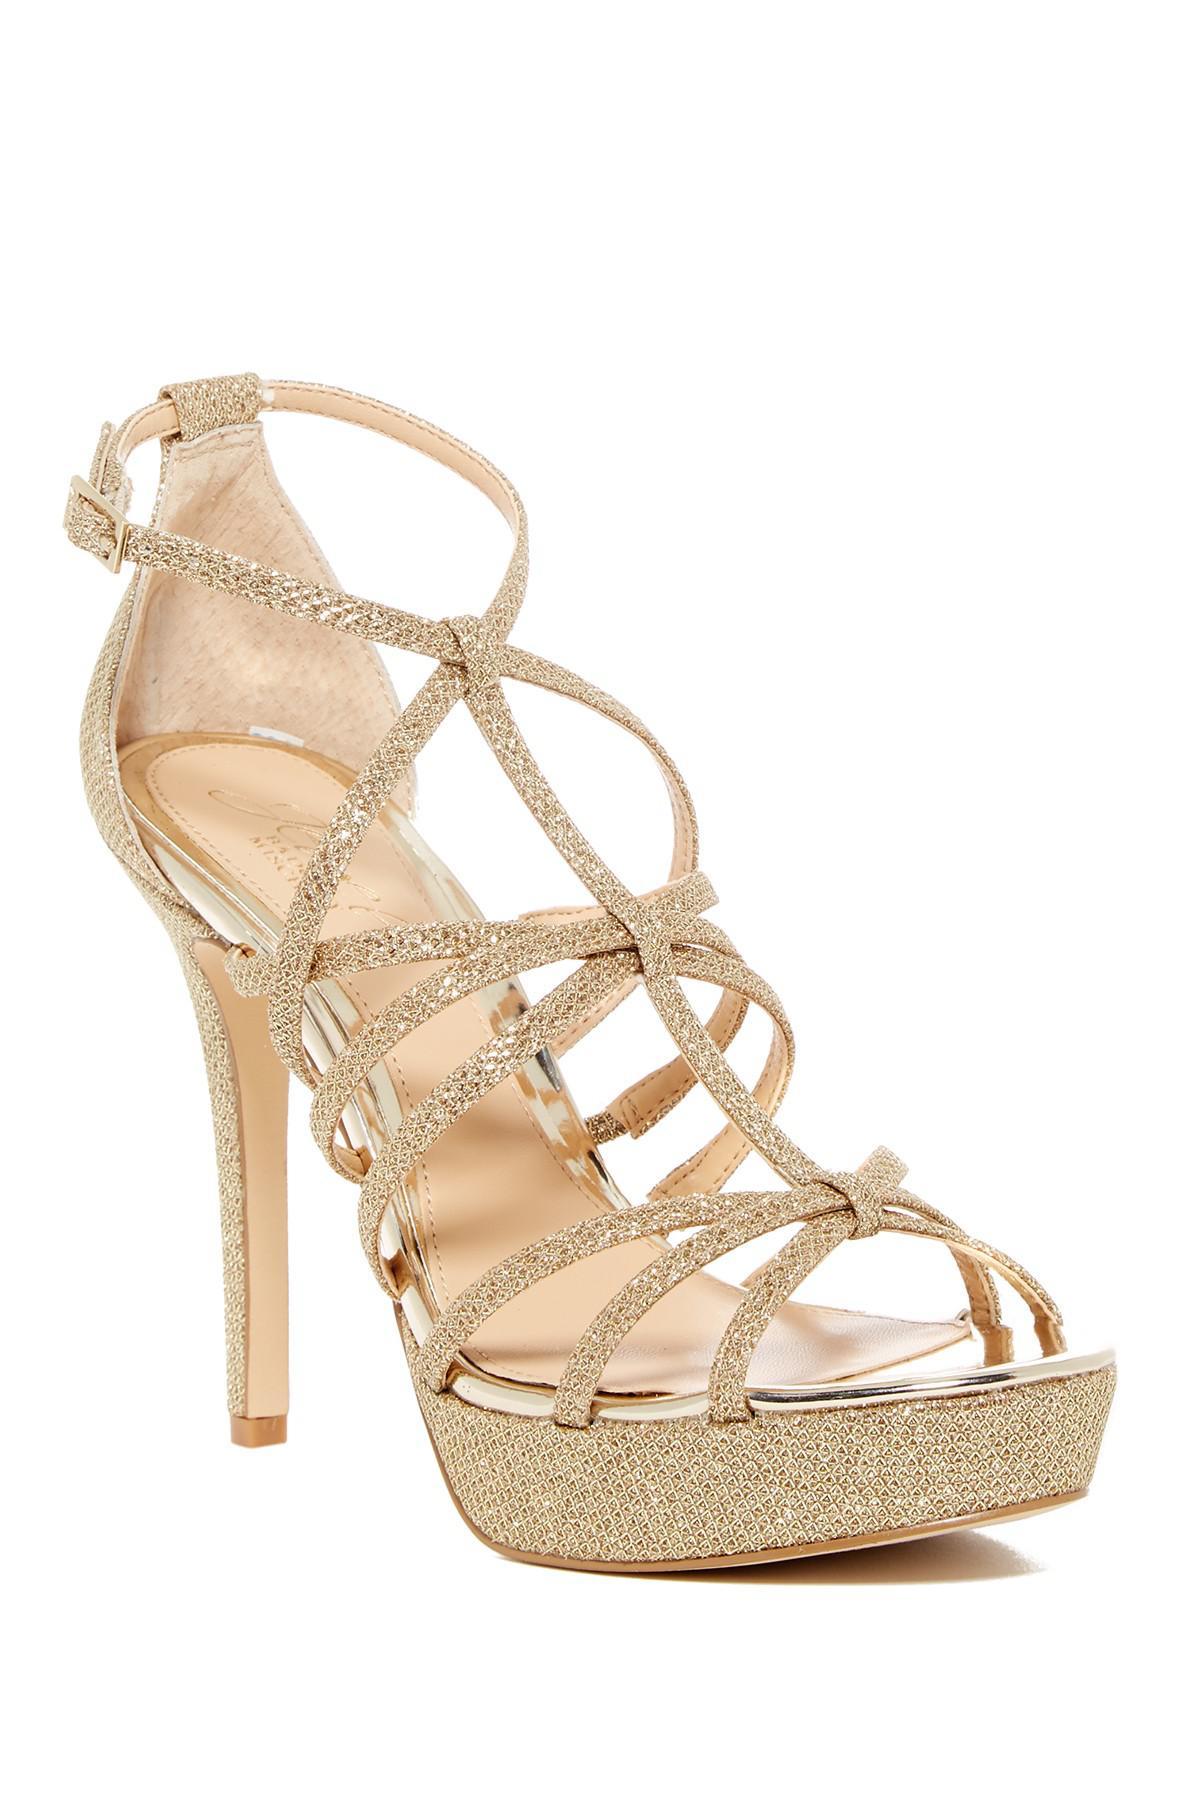 Badgley Mischka Taura Glitter Mesh Platform Sandal T0iaSy9